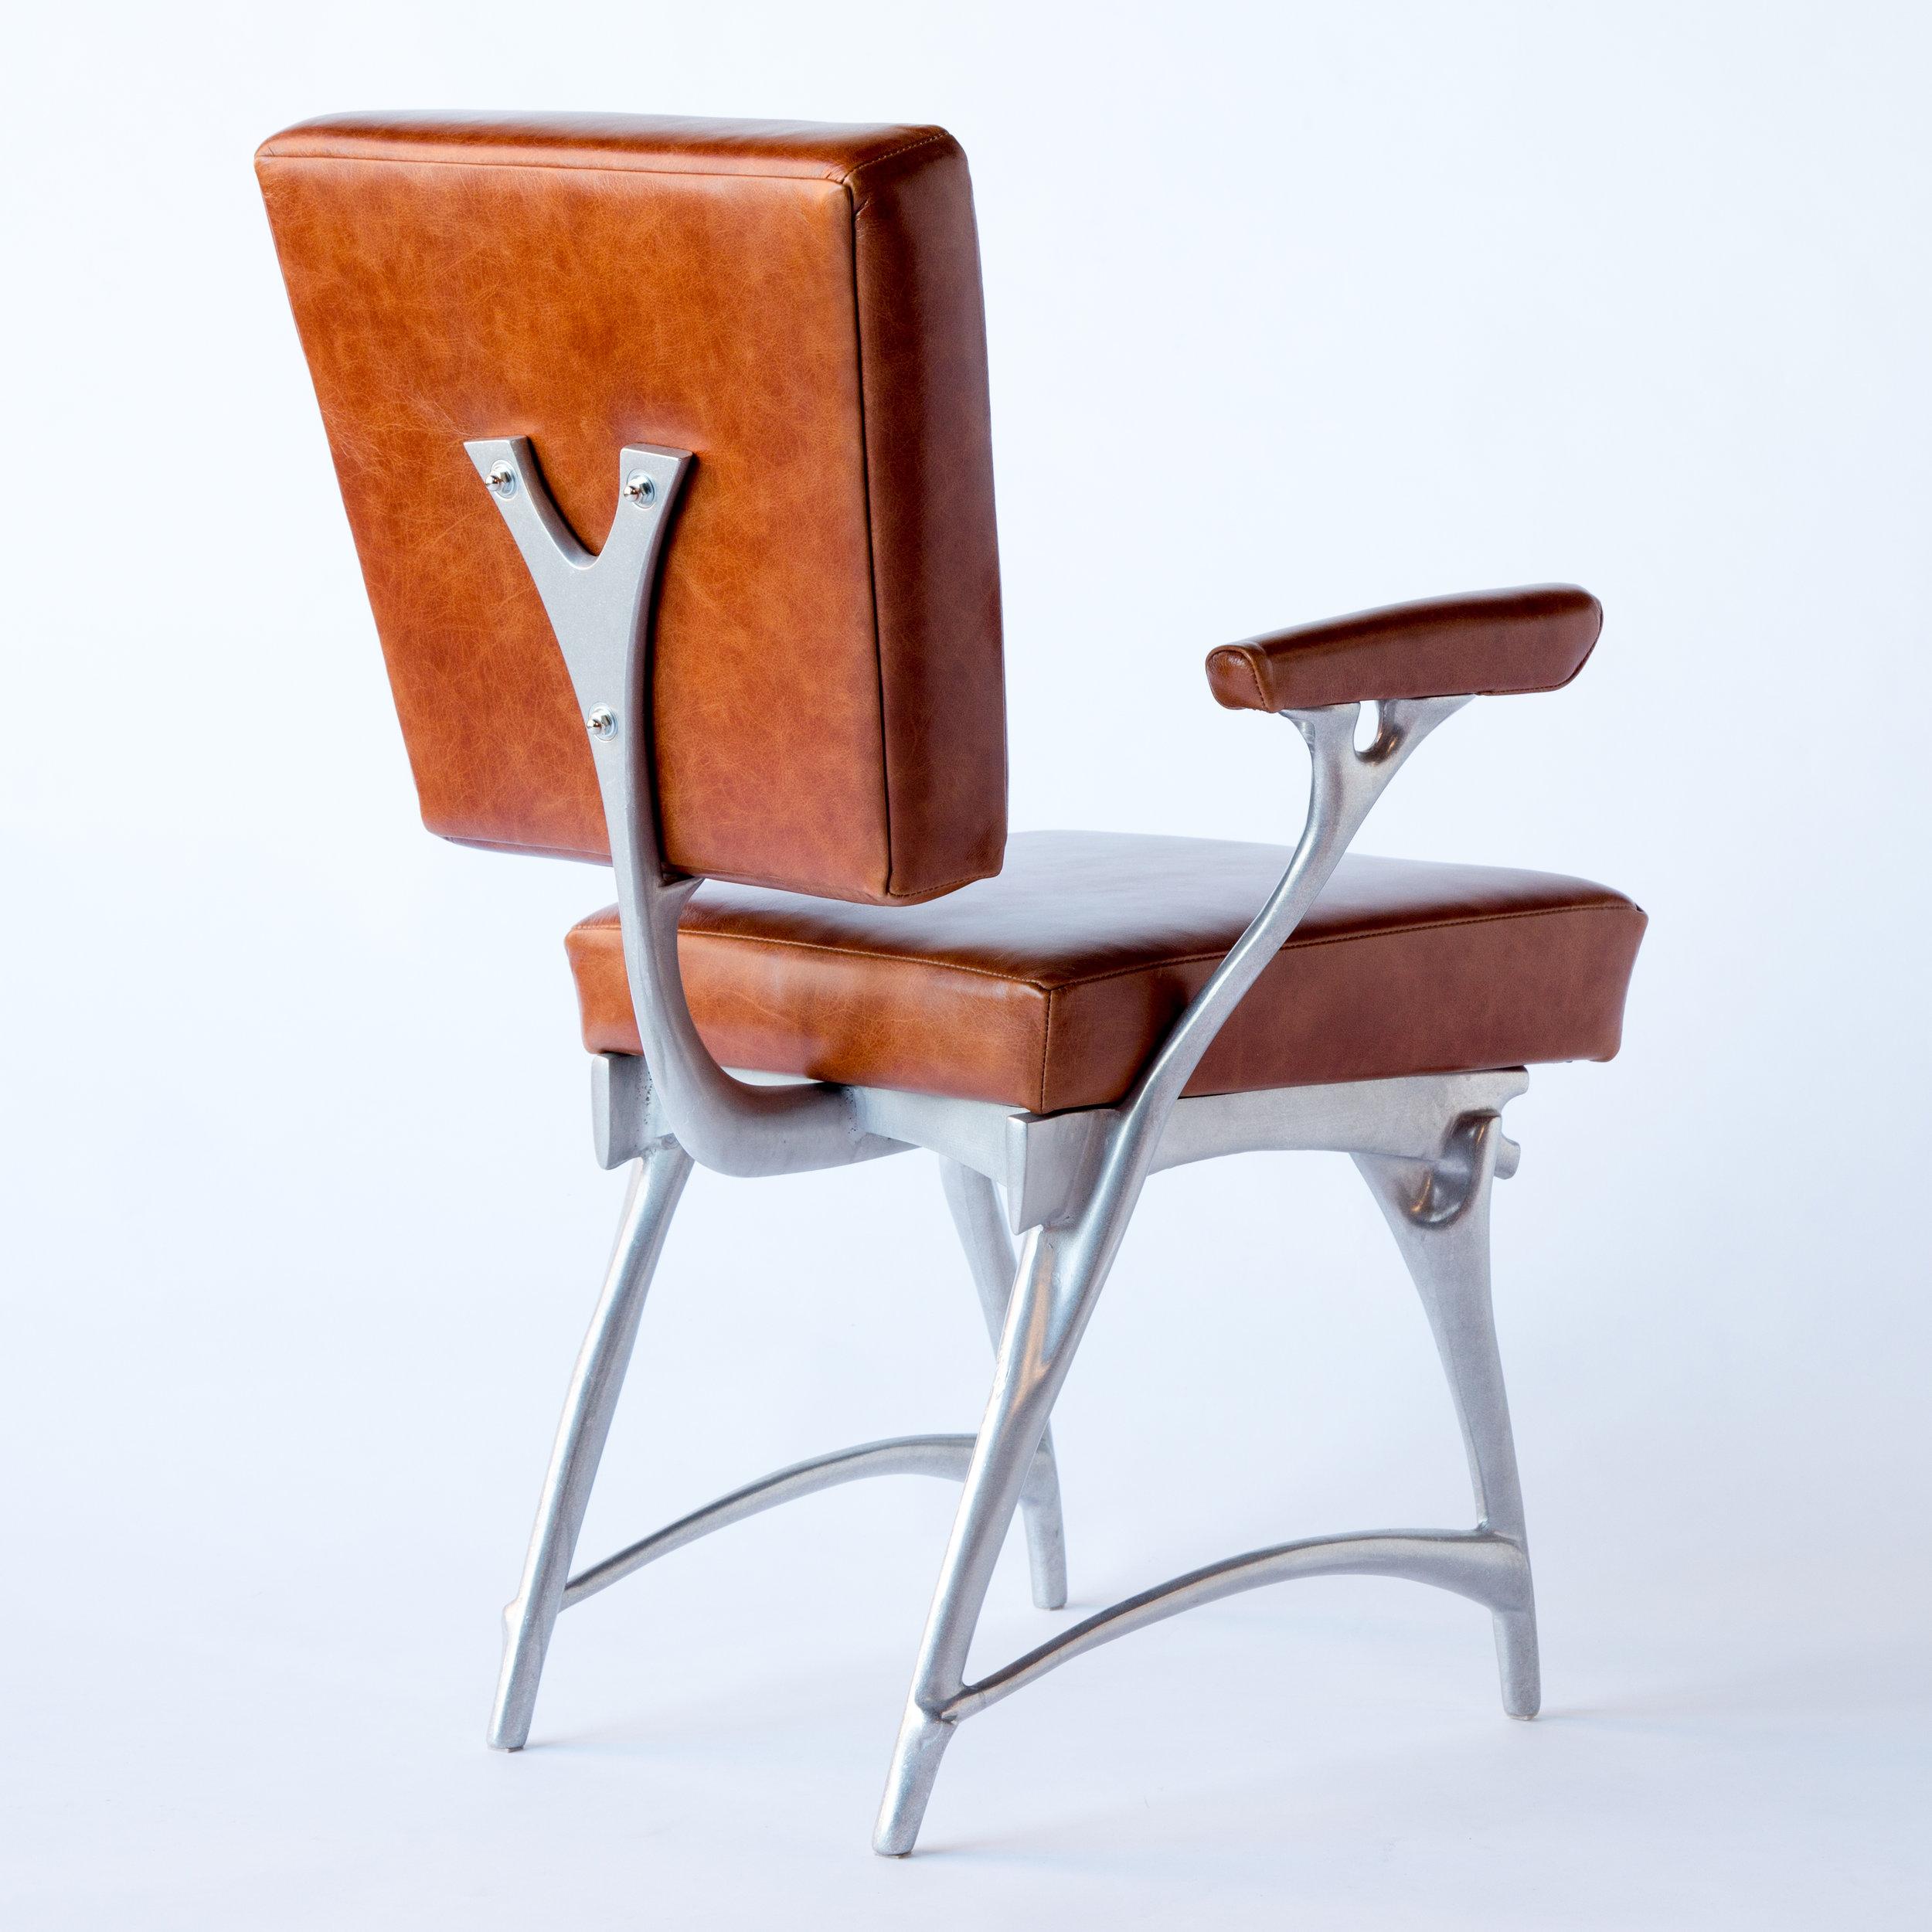 Twig Chair Light-6.jpg